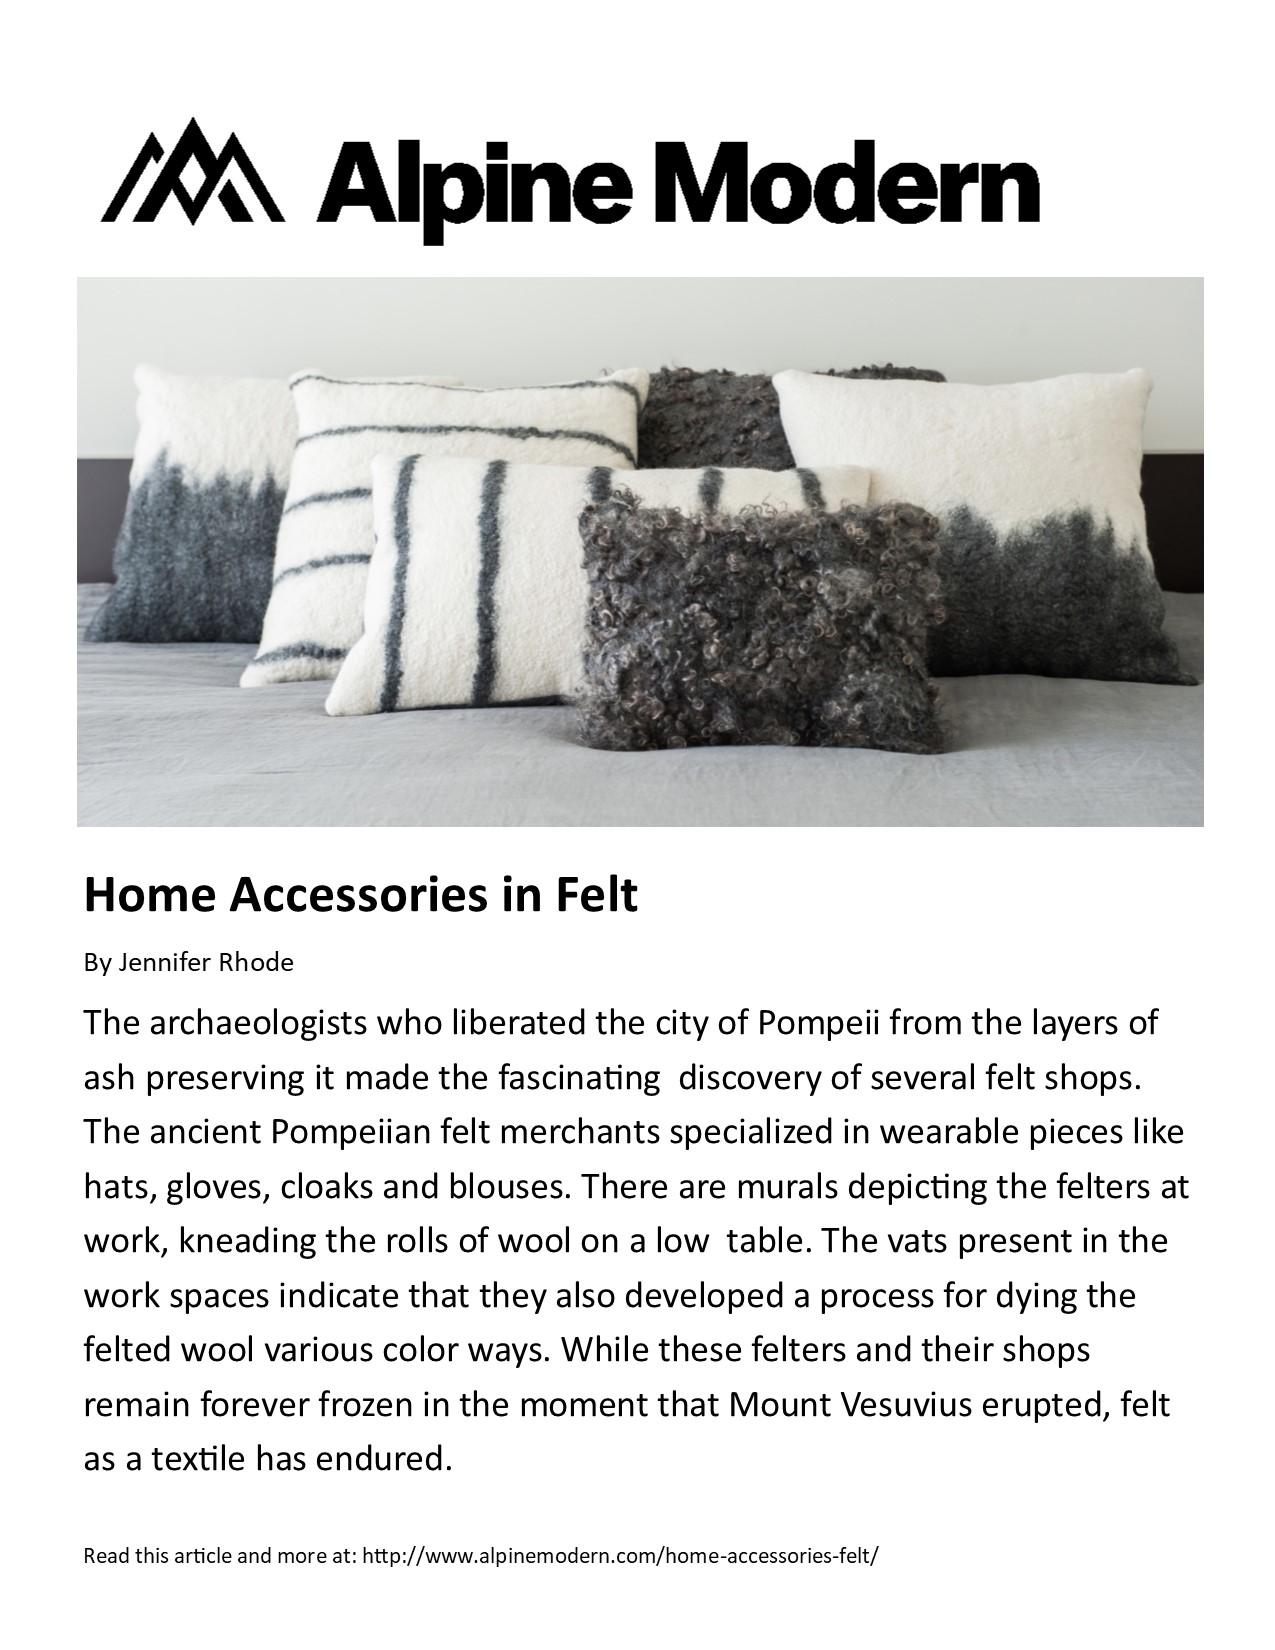 Home Accessories in Felt 06-20-17.jpg